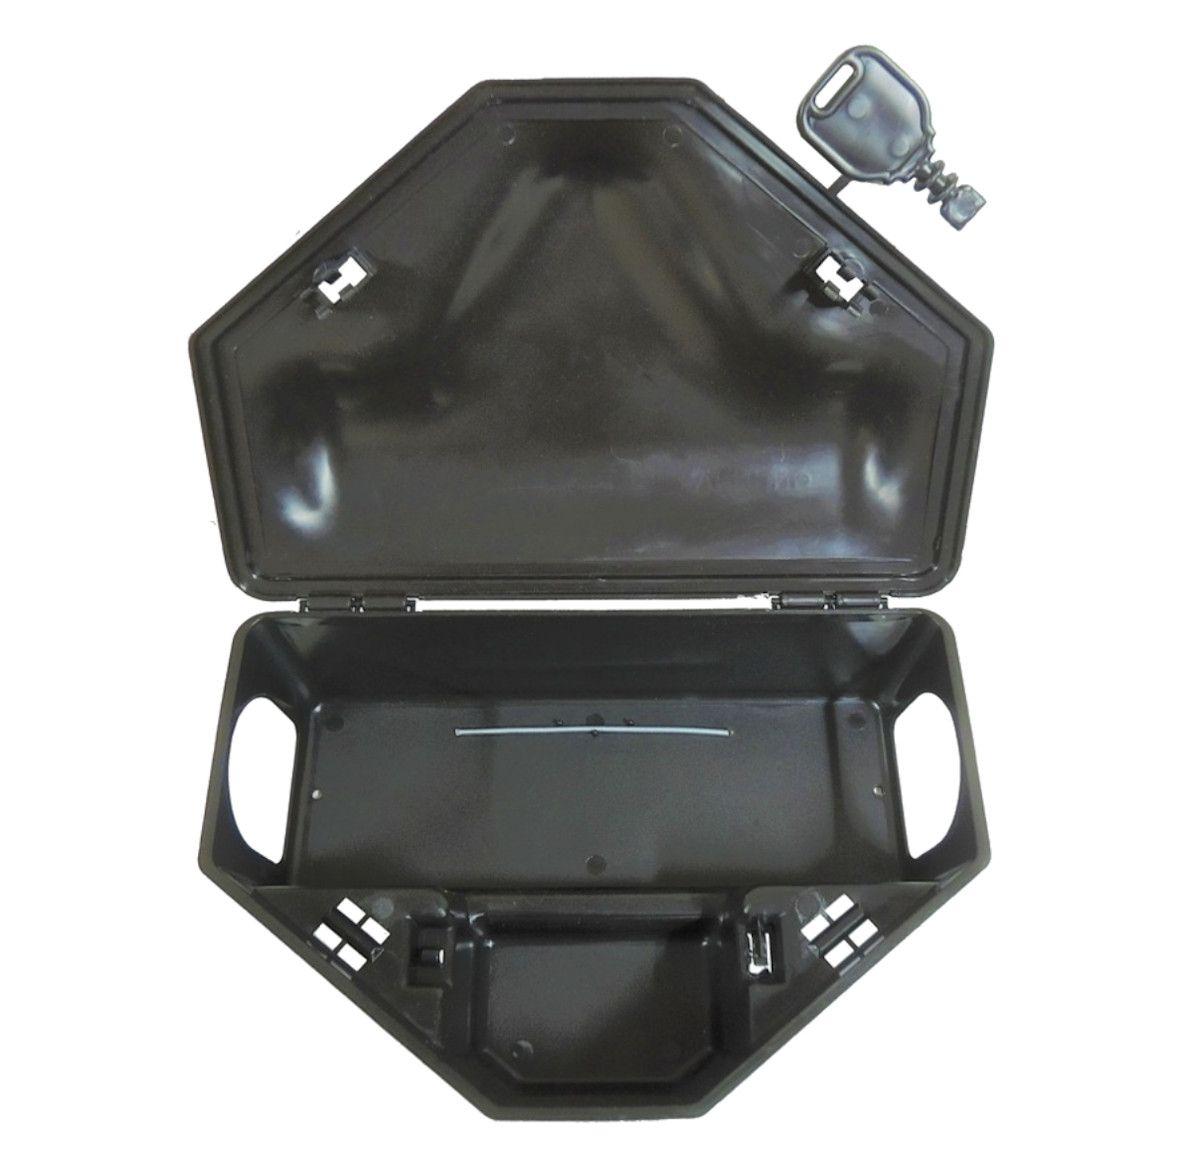 kit 61 Porta Iscas com travamento duplo - mata rato, ratoeira